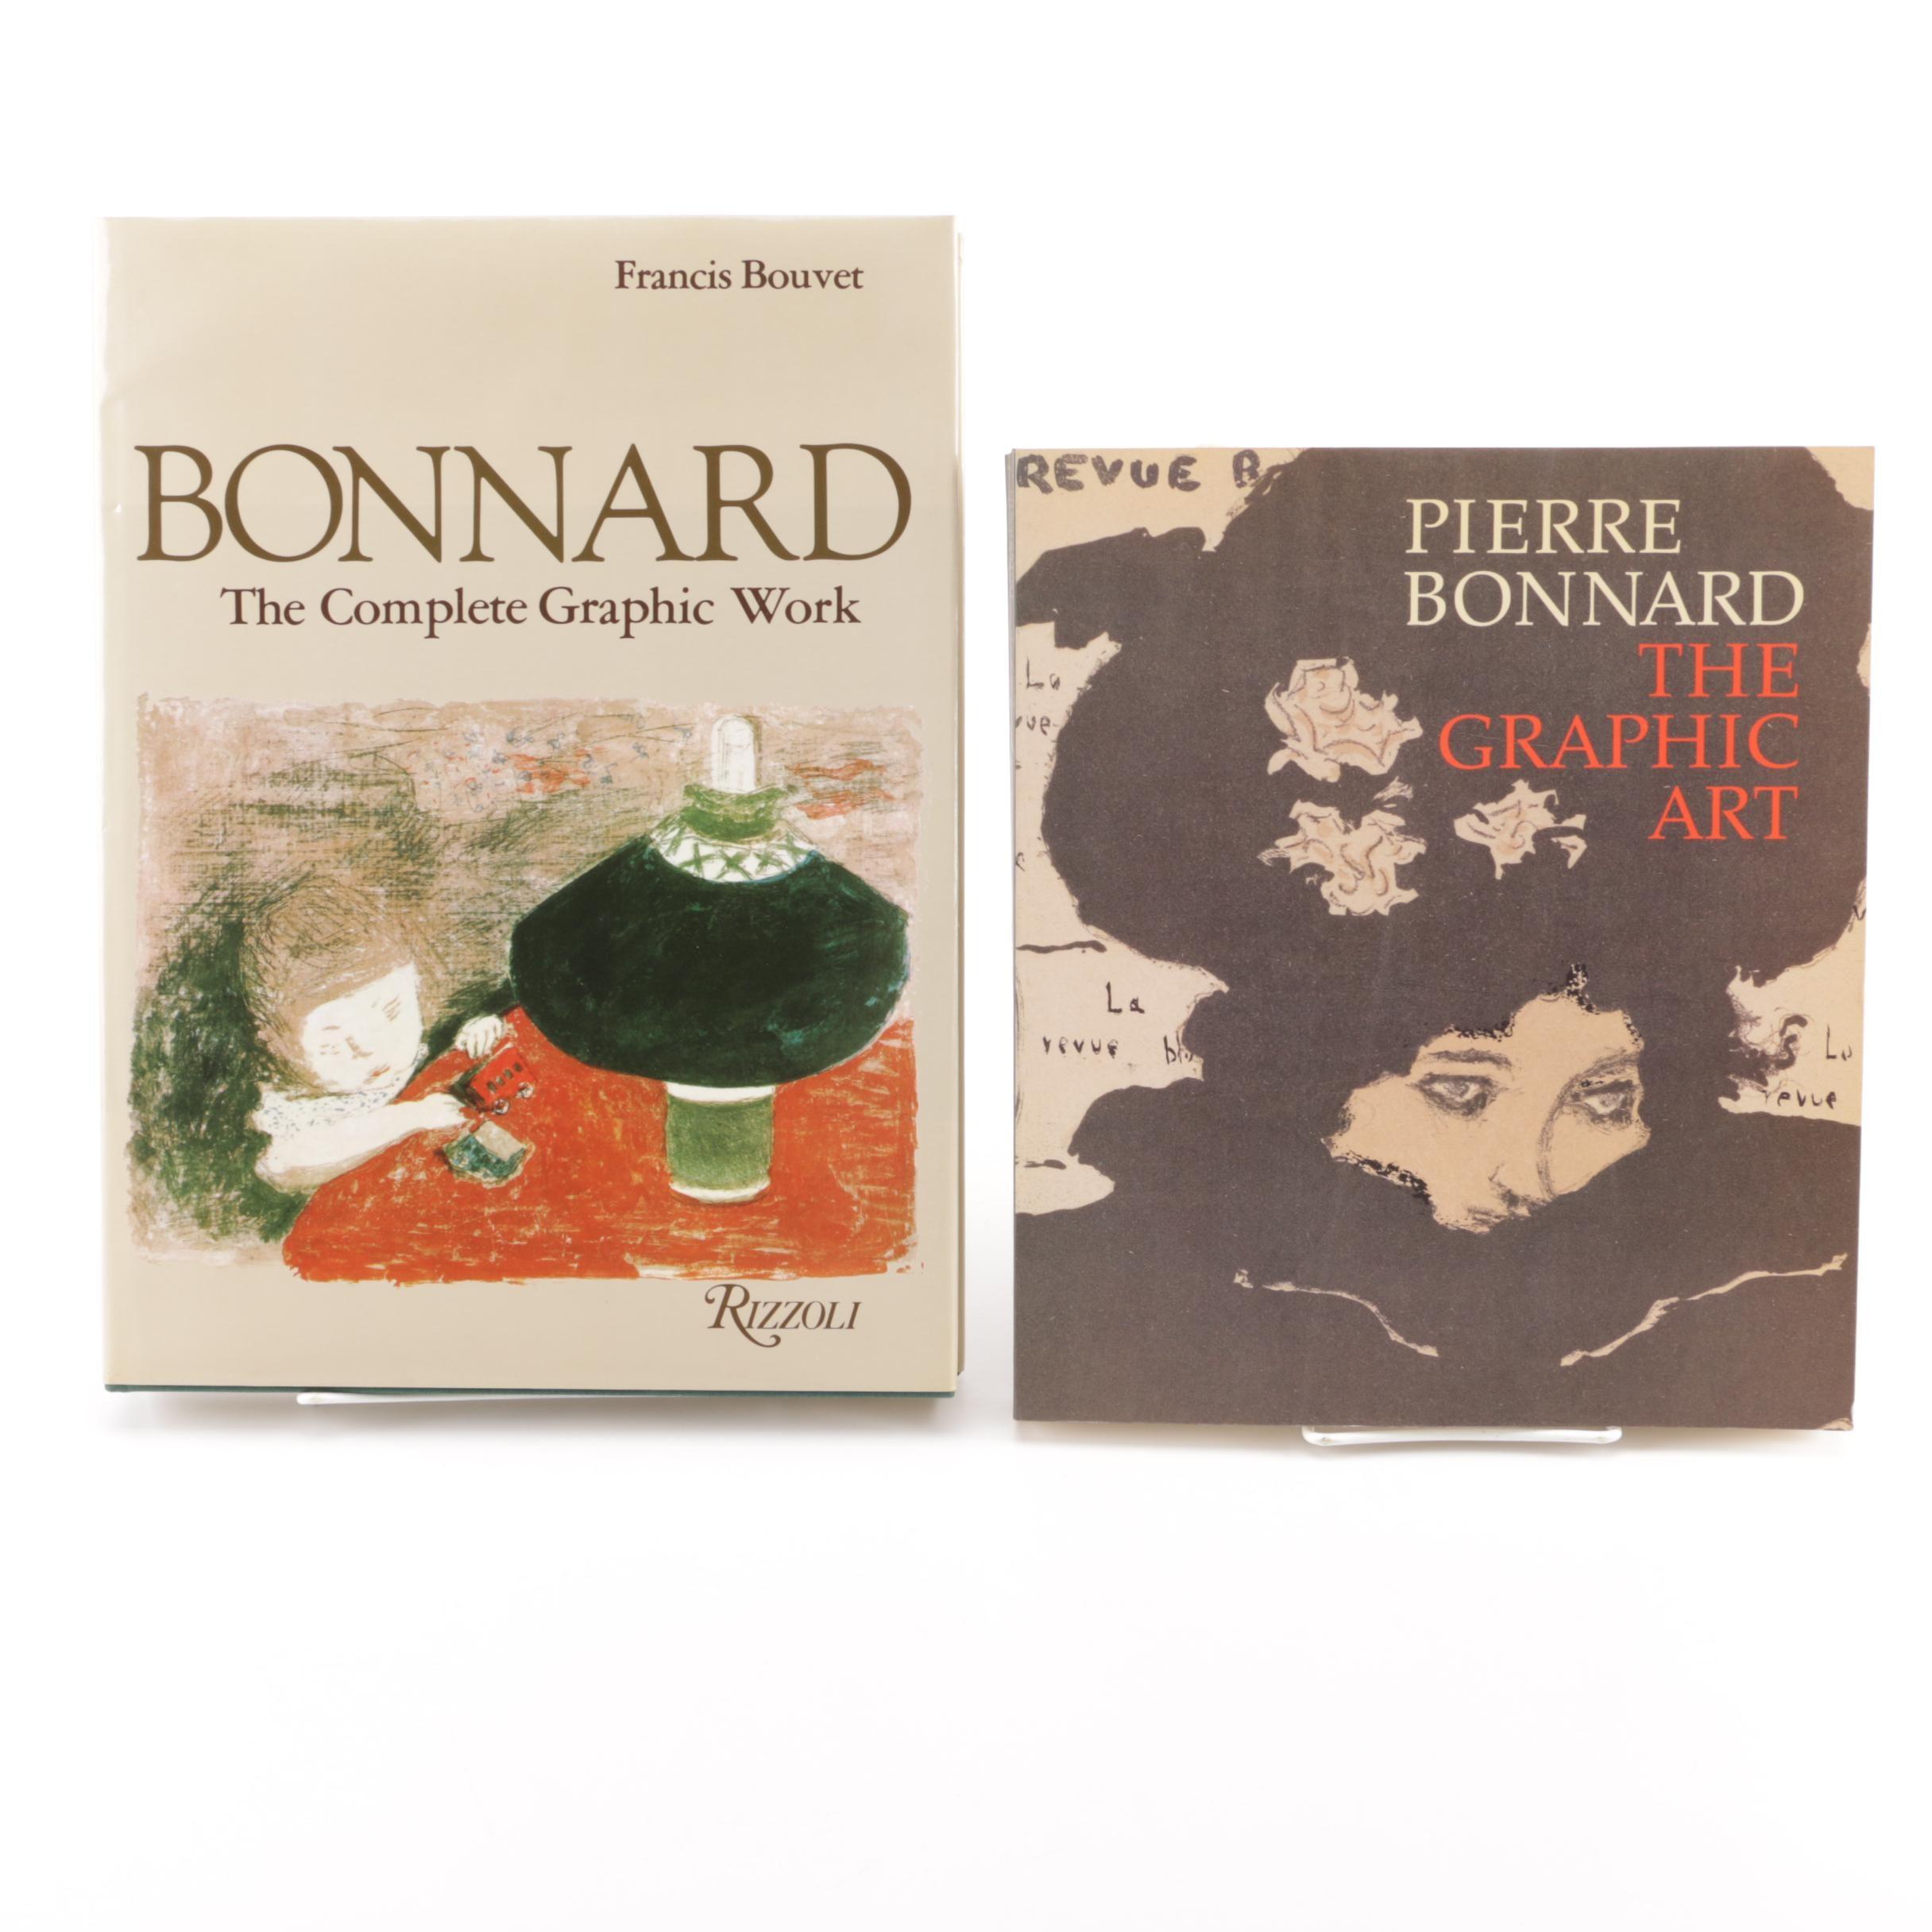 Books on Pierre Bonnard